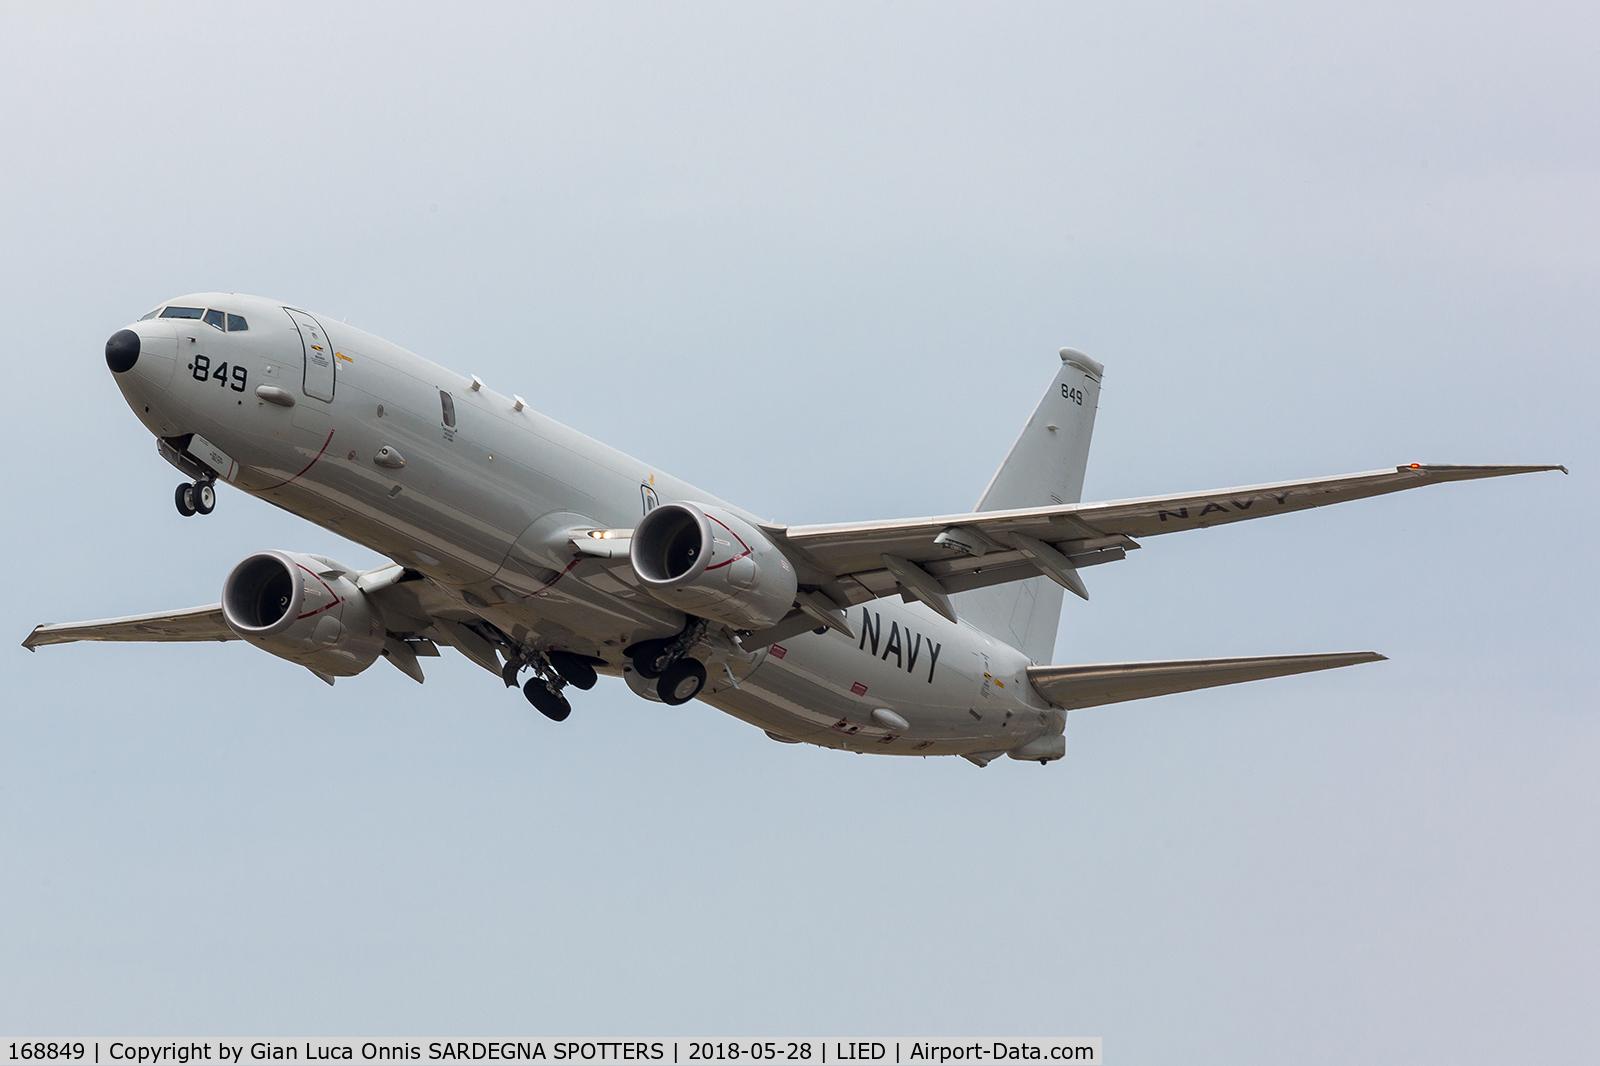 168849, Boeing P-8A Poseidon C/N 44141, TAKE OFF 35R